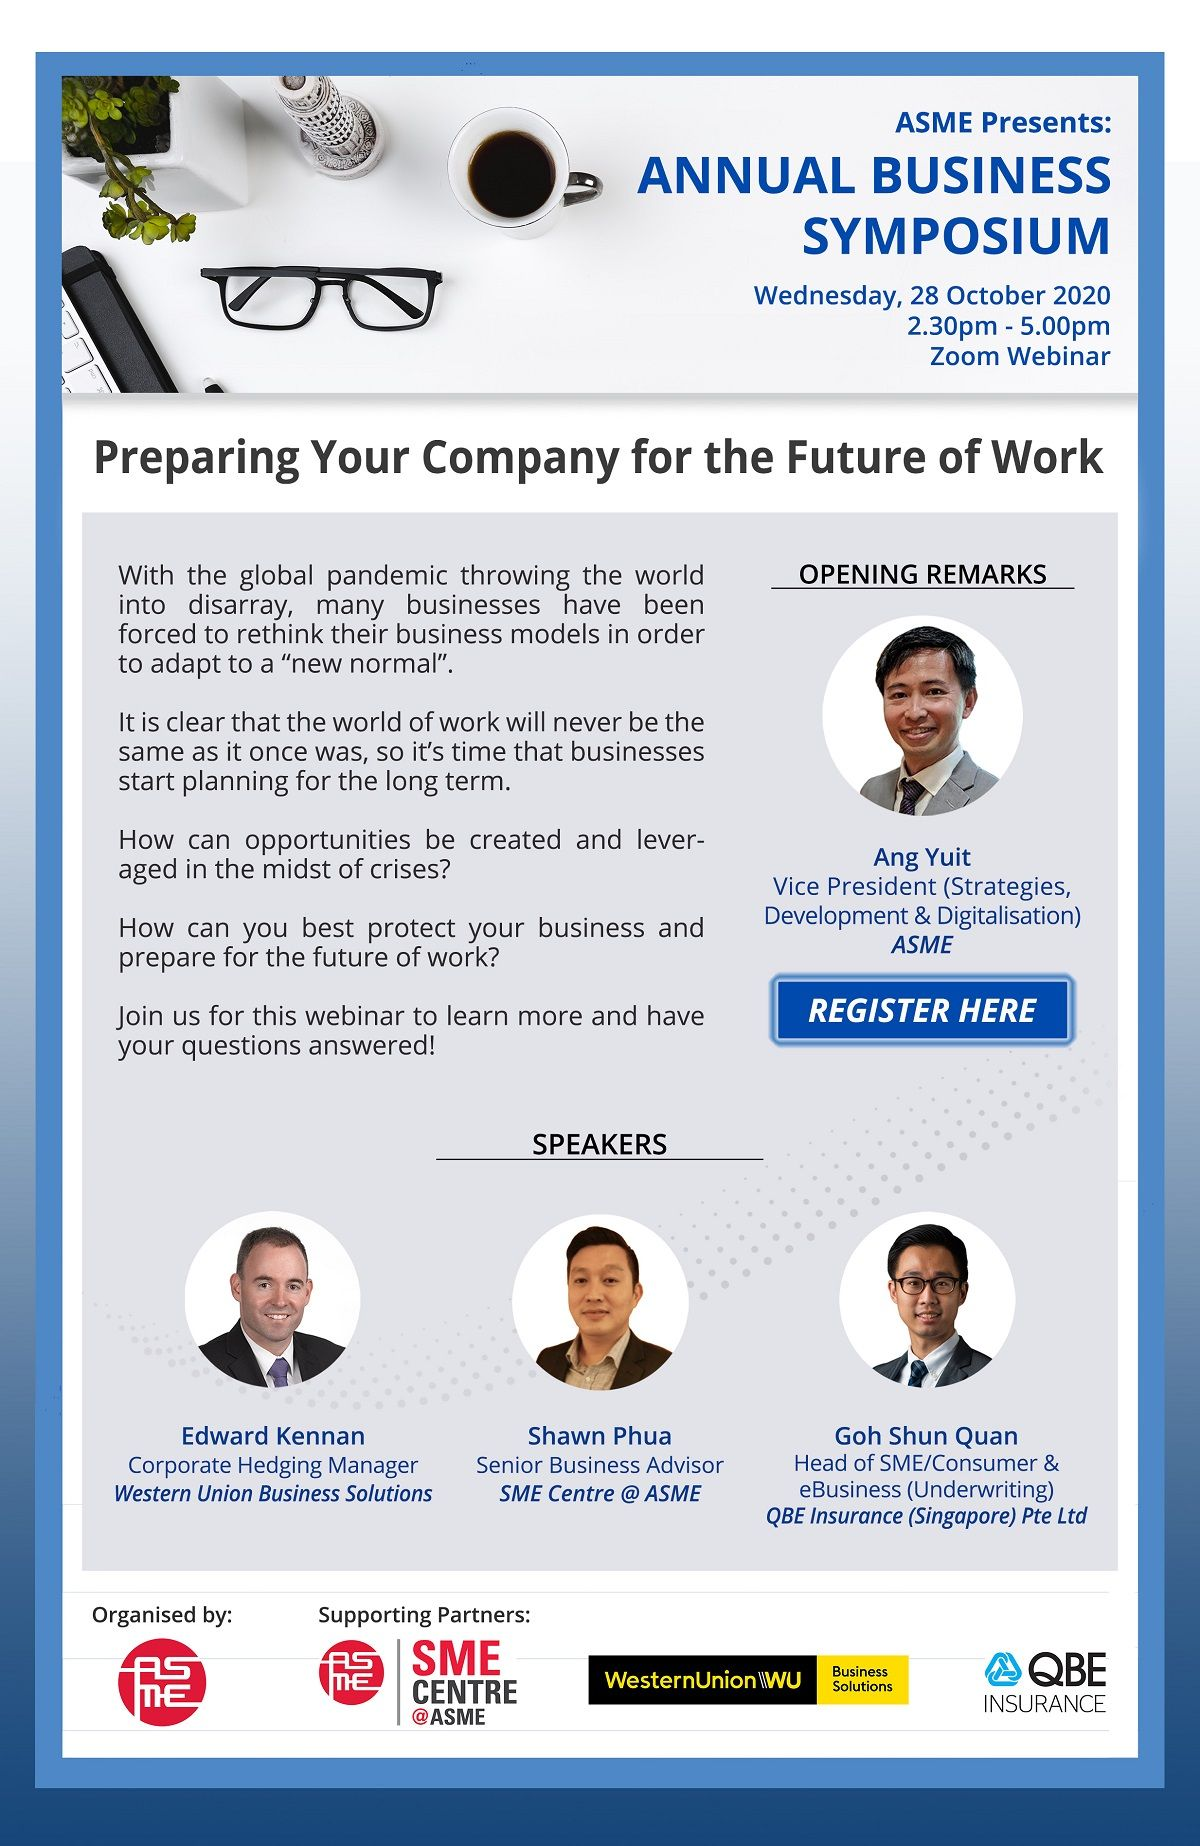 ASME Business Symposium